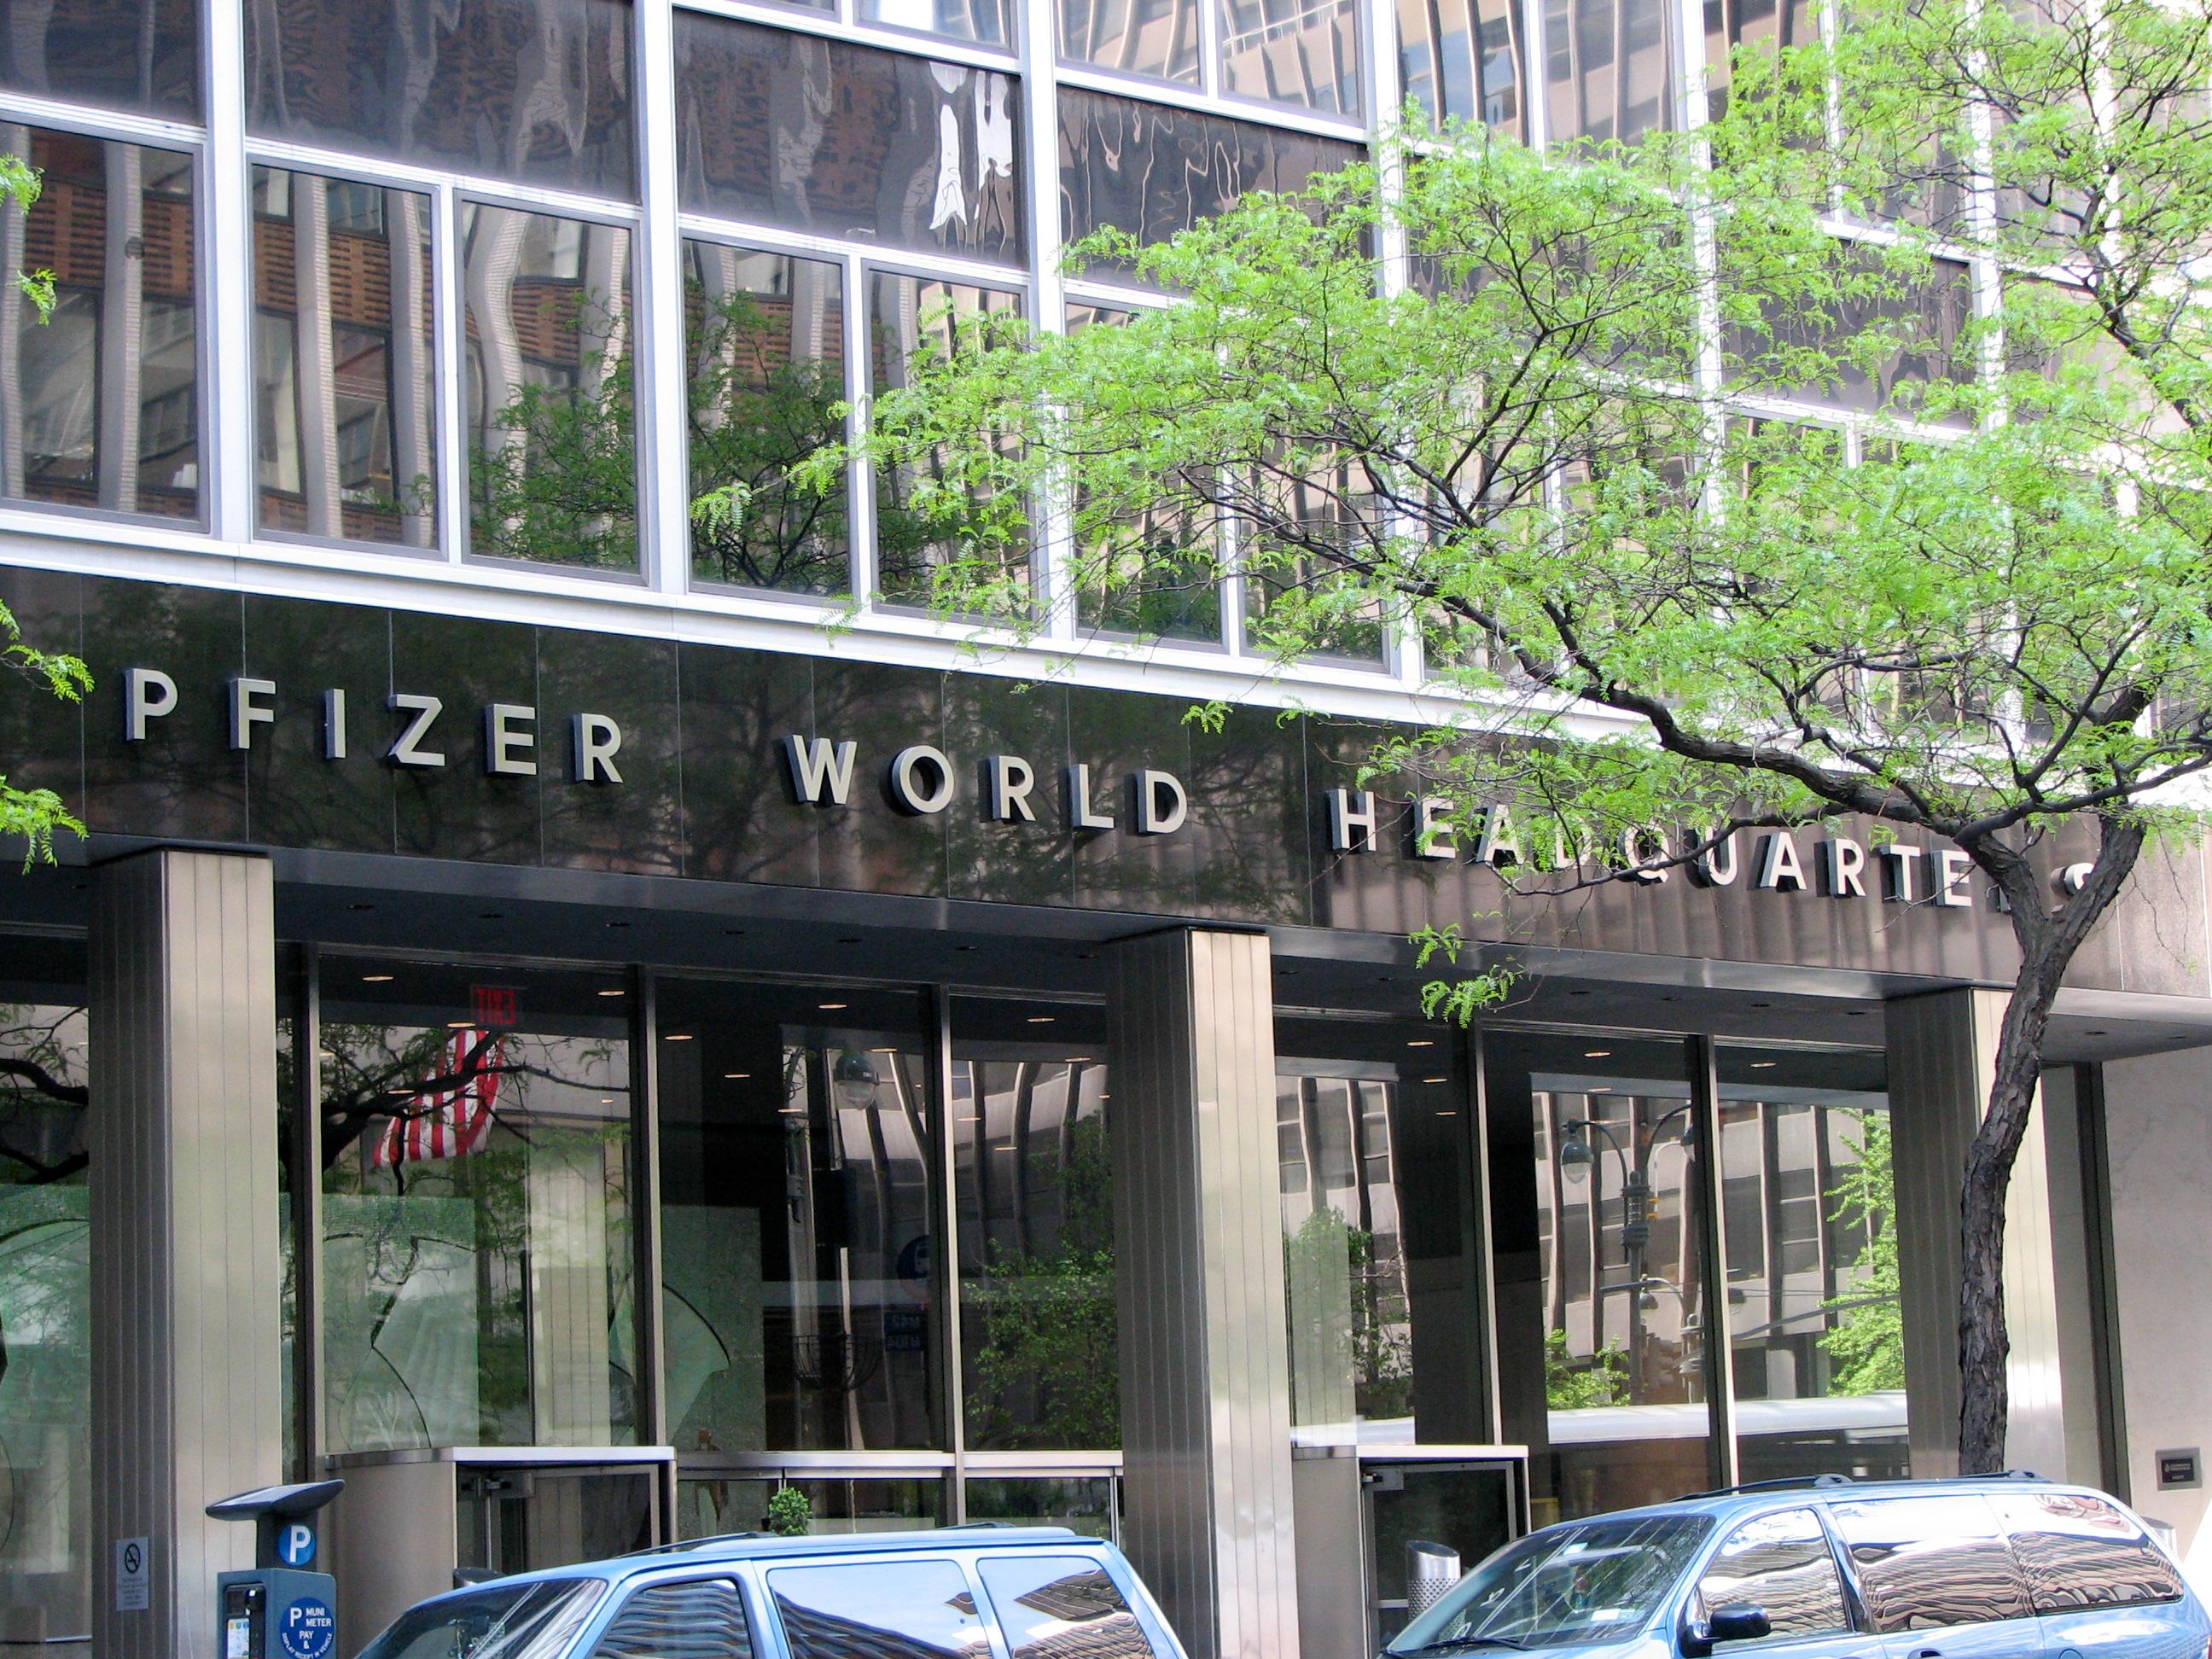 The long-anticipated Pfizer split-up won't happen, CEO says | FiercePharma